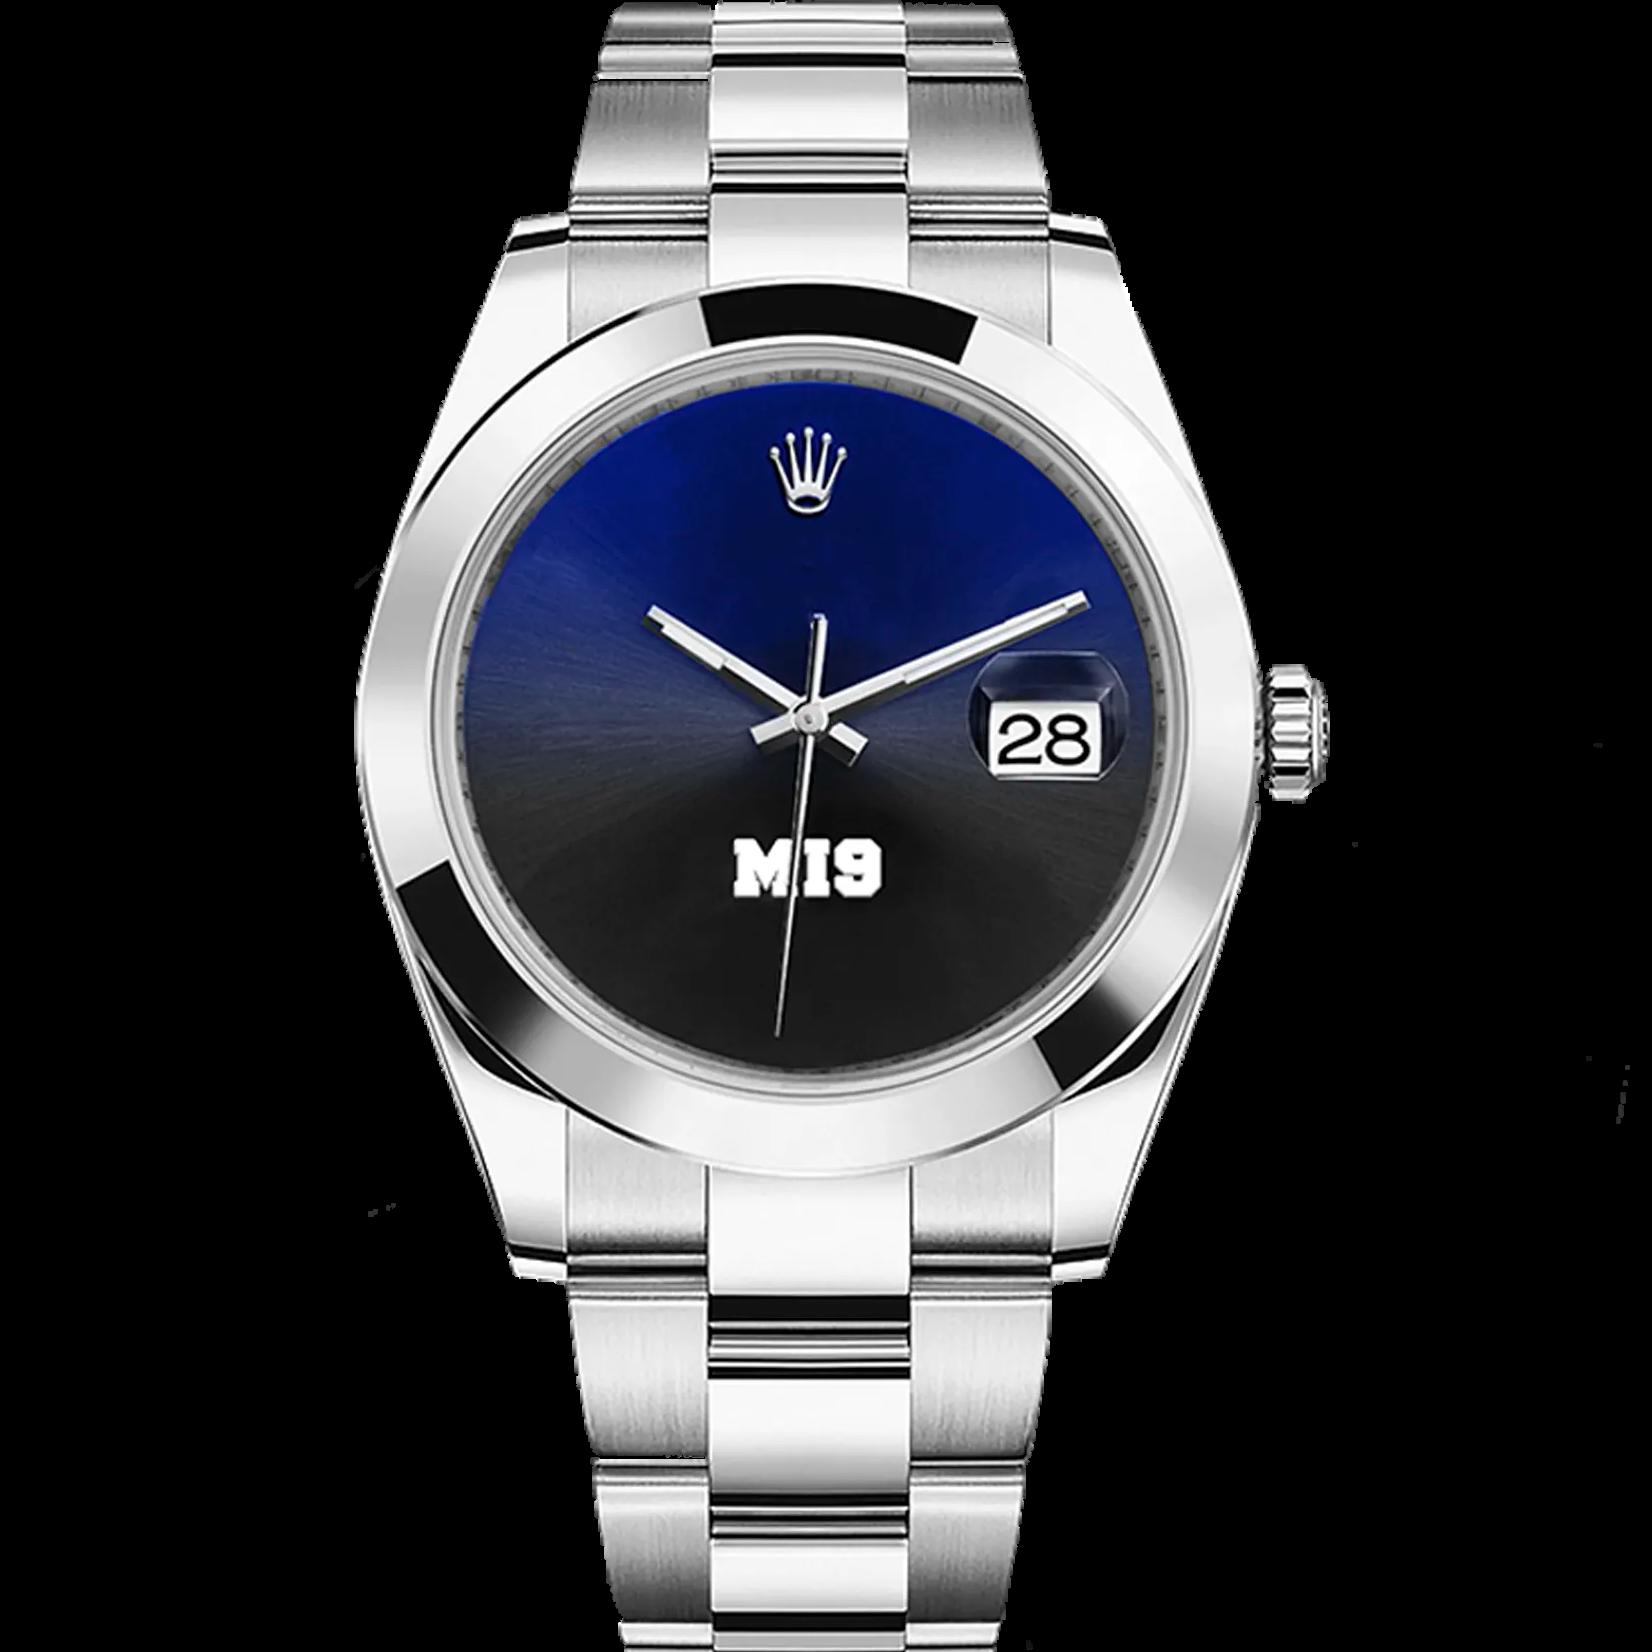 Customised Rolex Datejust for Mauro Icadi